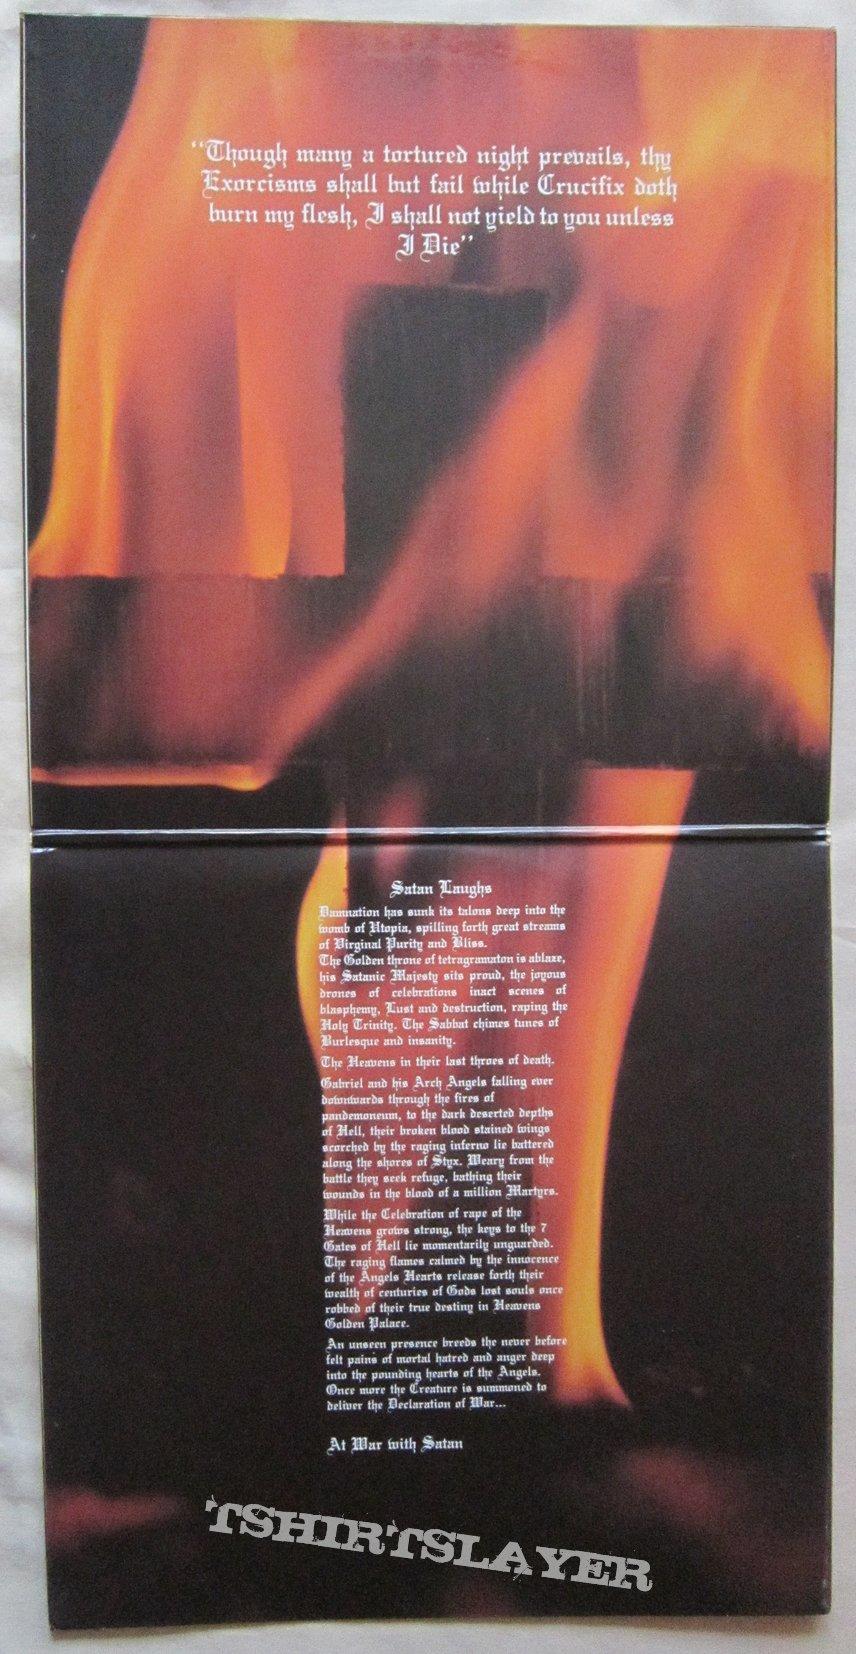 VENOM At war with satan French press LP 1984